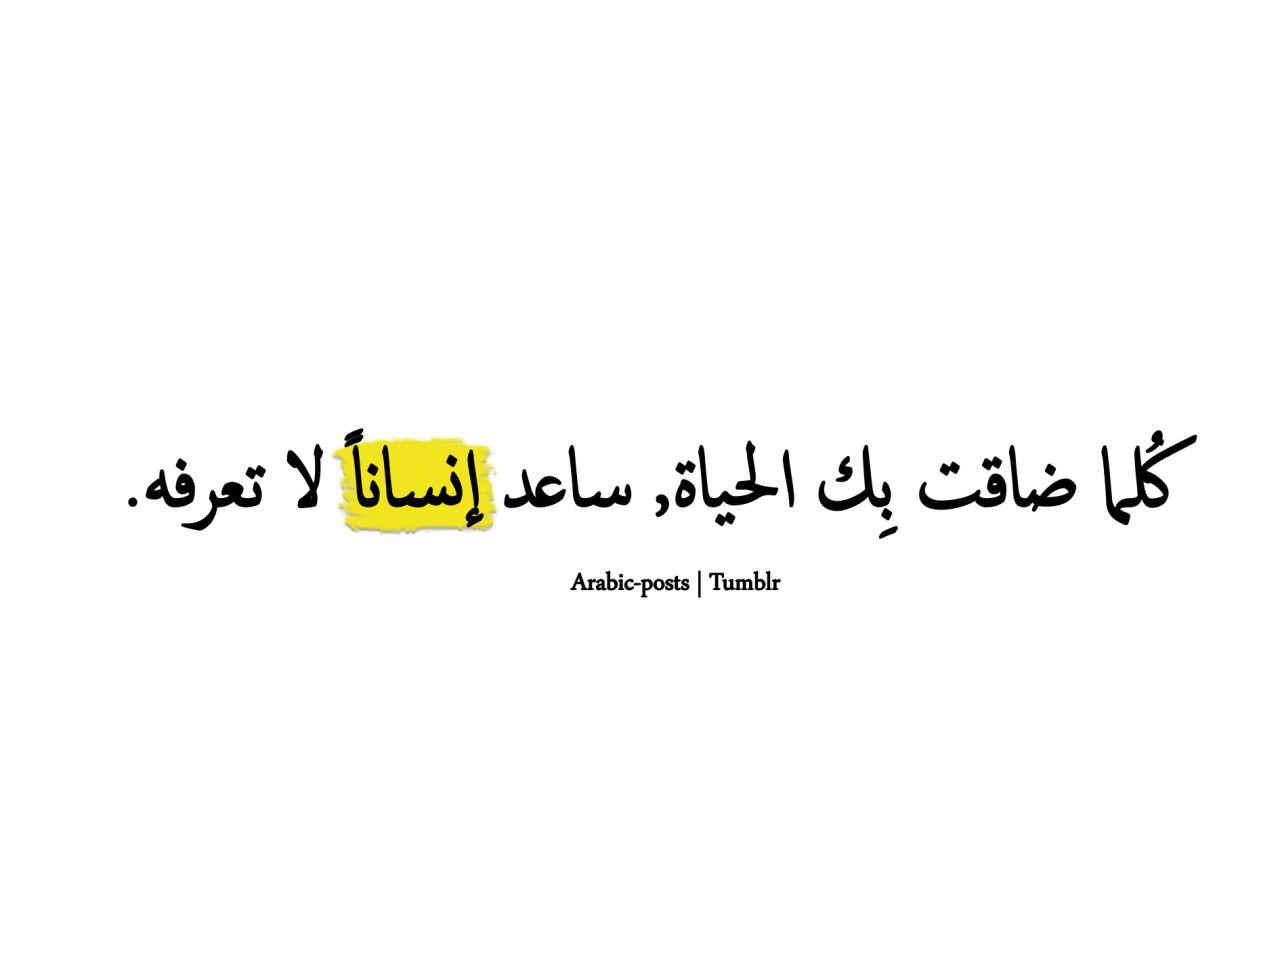 Life Quotes In Arabic With English Translation طريقة للسعادة   مقــهى أحلى الكلمات و بريـــق حروفها  Pinterest